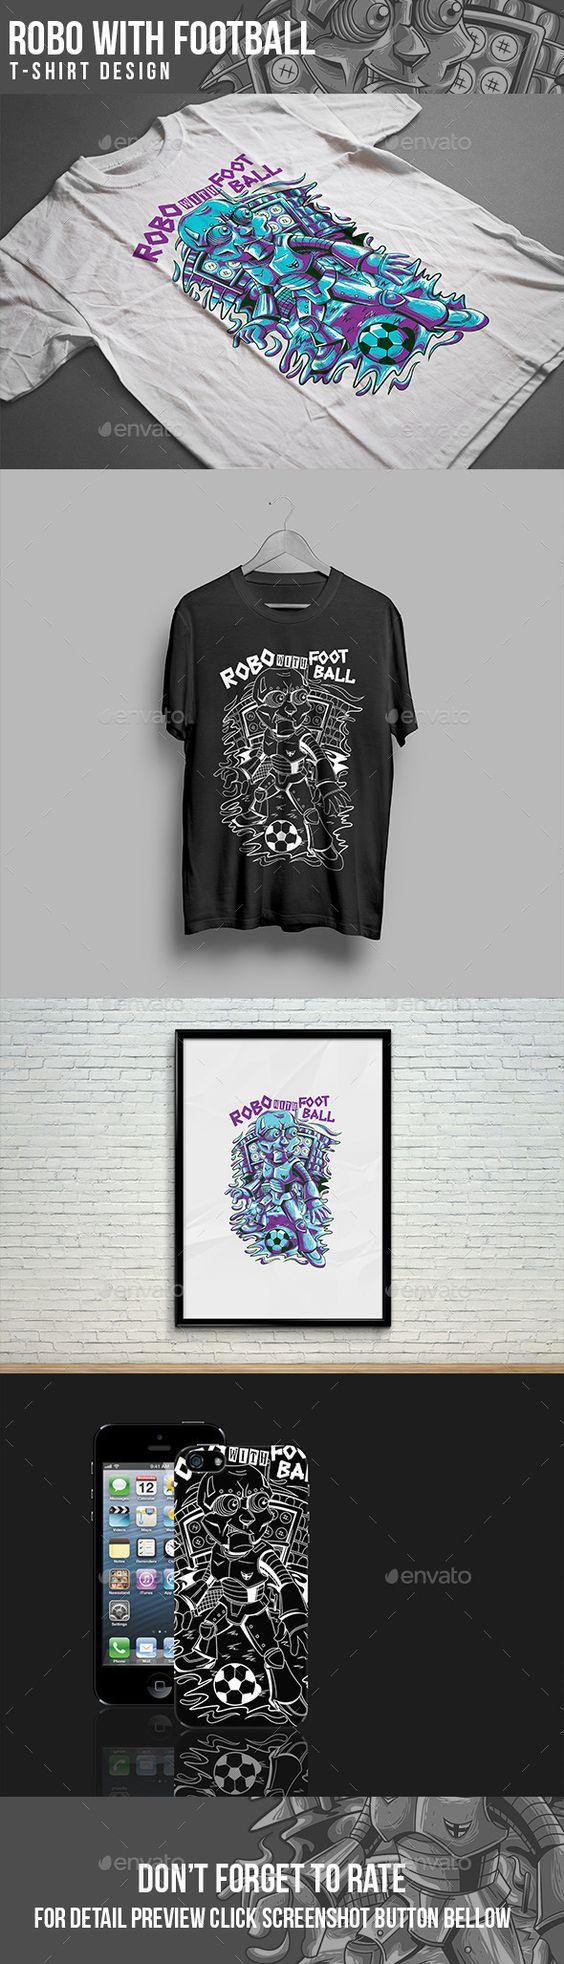 Shirt design eps - Robo With Football T Shirt Illustration Vector Eps Ai Design Download Http